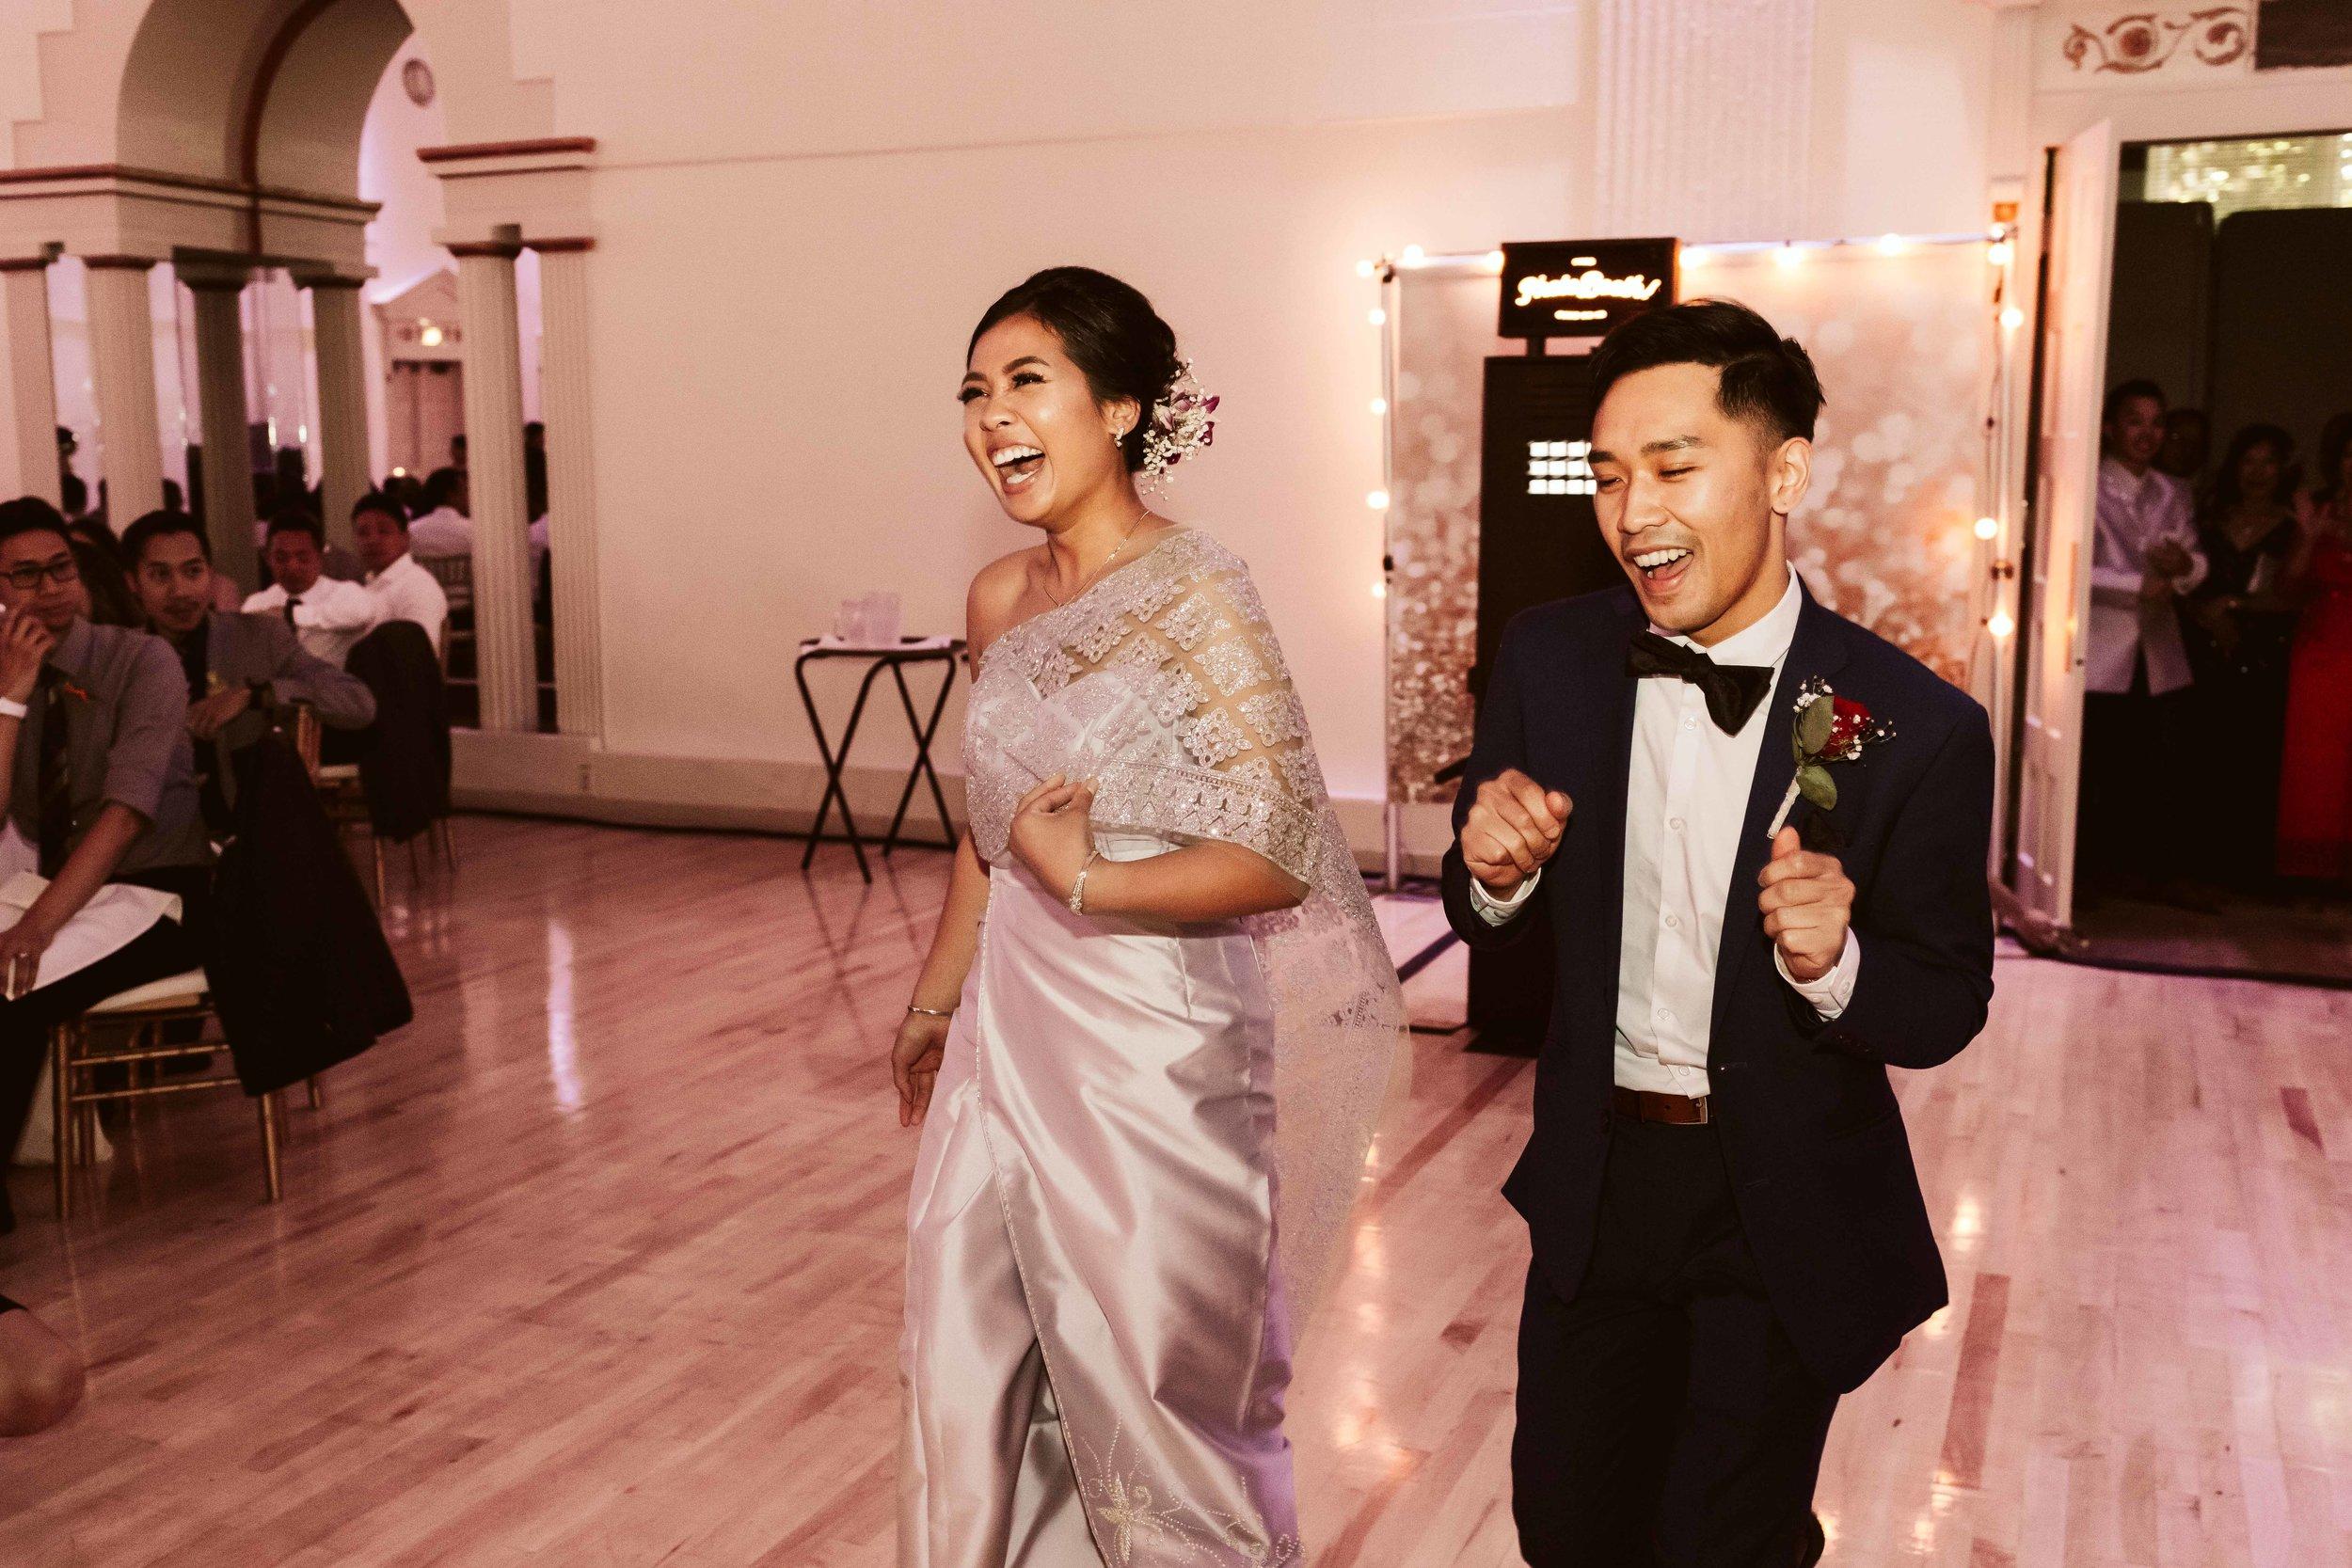 melody-ballroom-portland-wedding-96.jpg